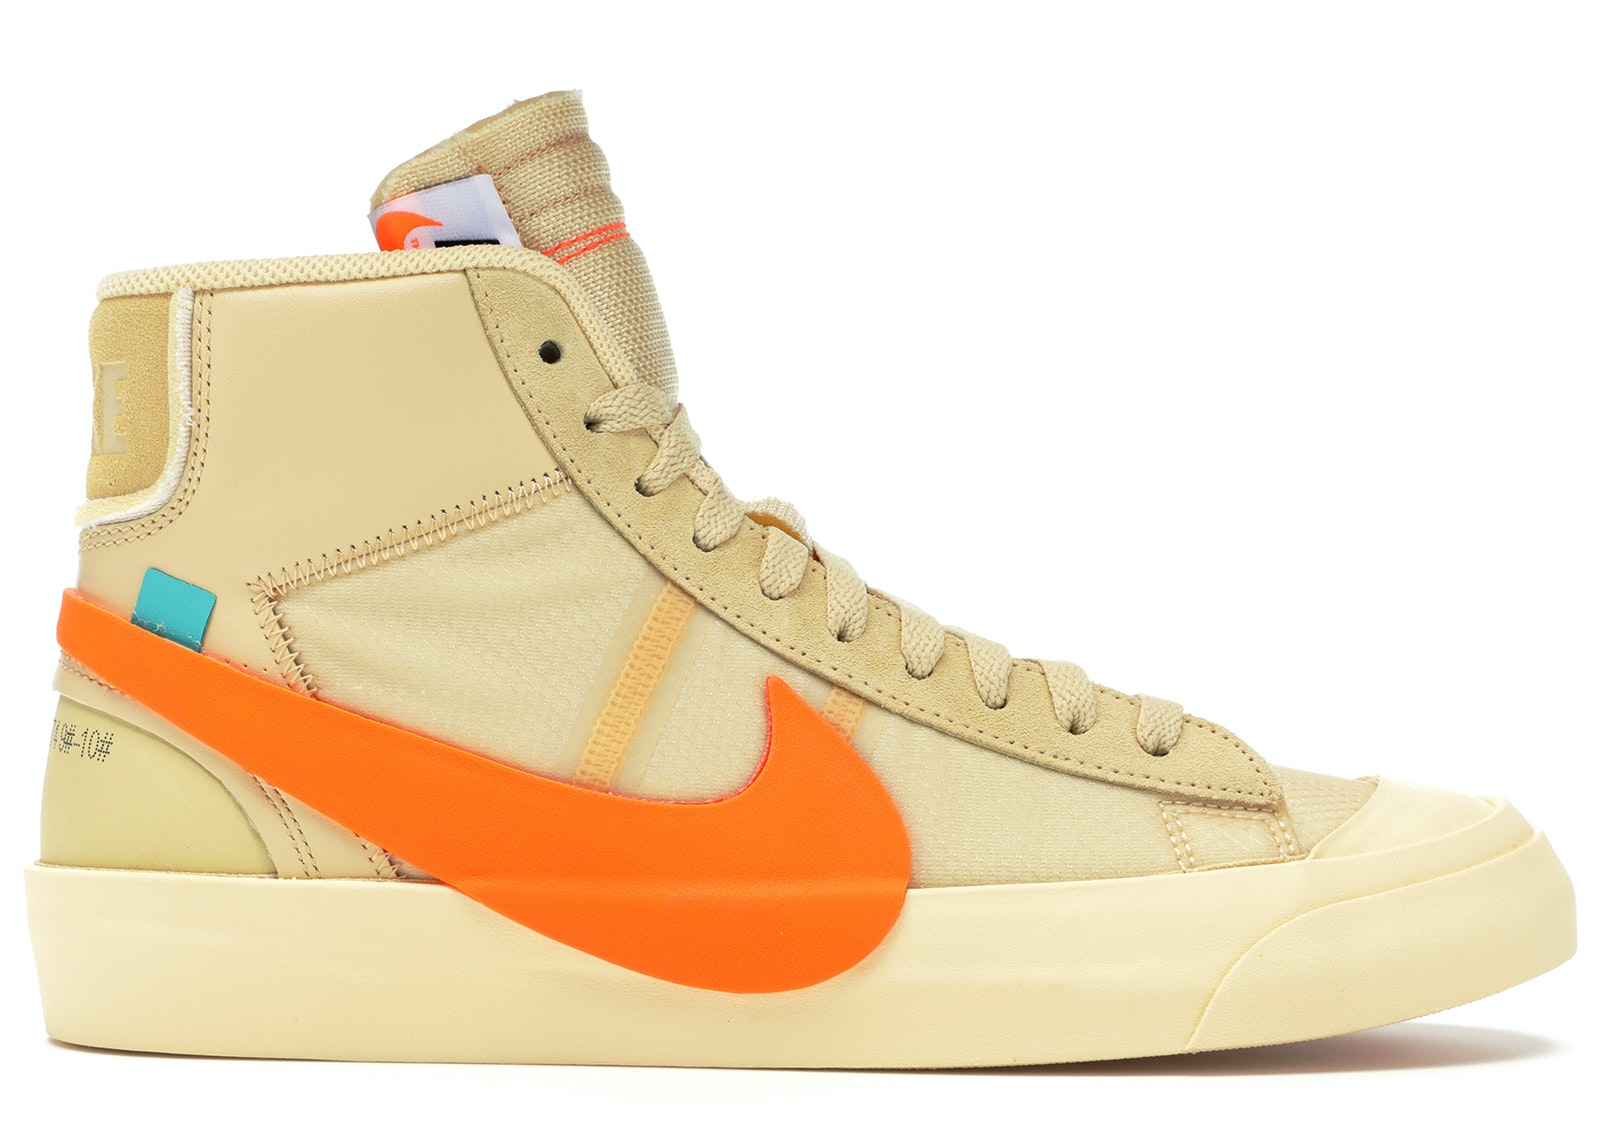 cccc0a469b4eb Nike Blazer Mid Off-White All Hallow\u0027s Eve - AA3832-700;